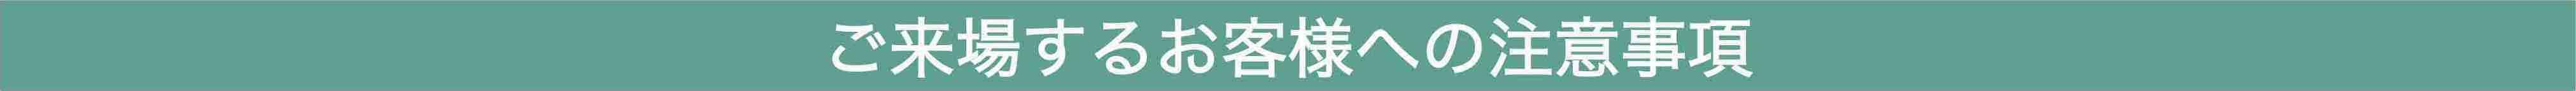 rc2021_cyuui_bar